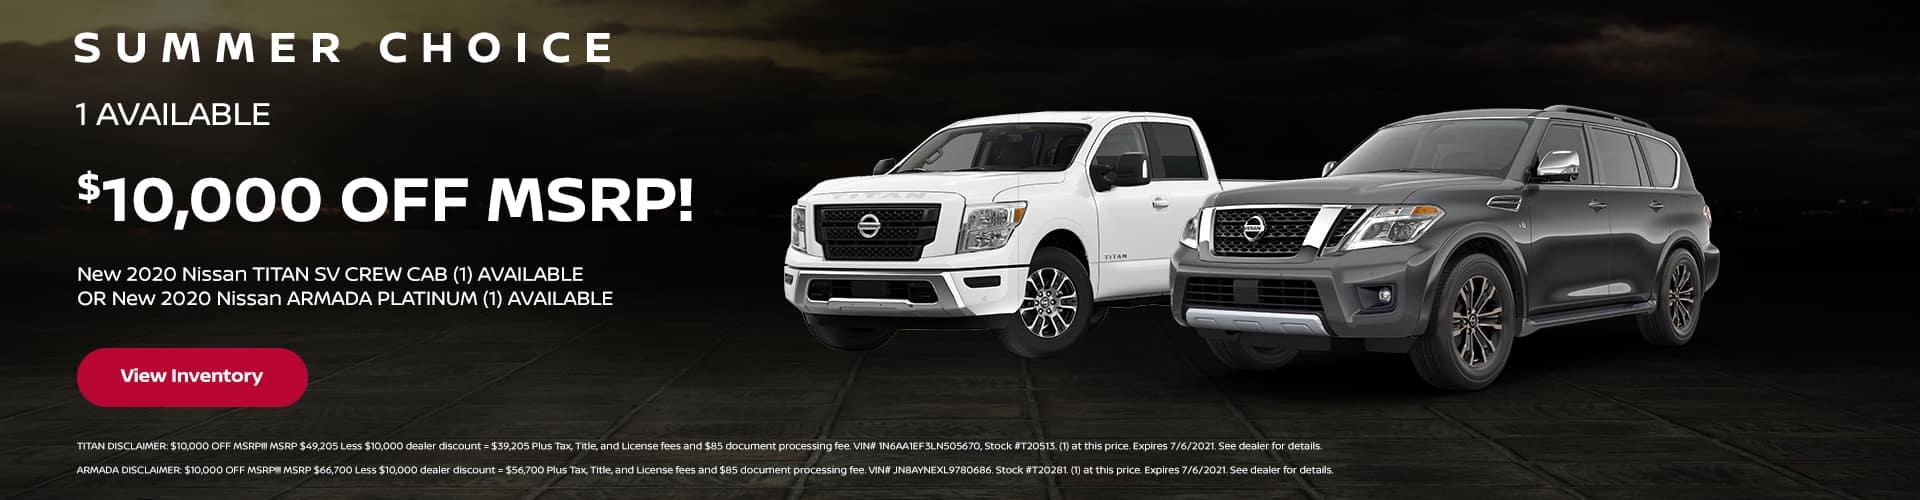 Nissan Titan and Armada